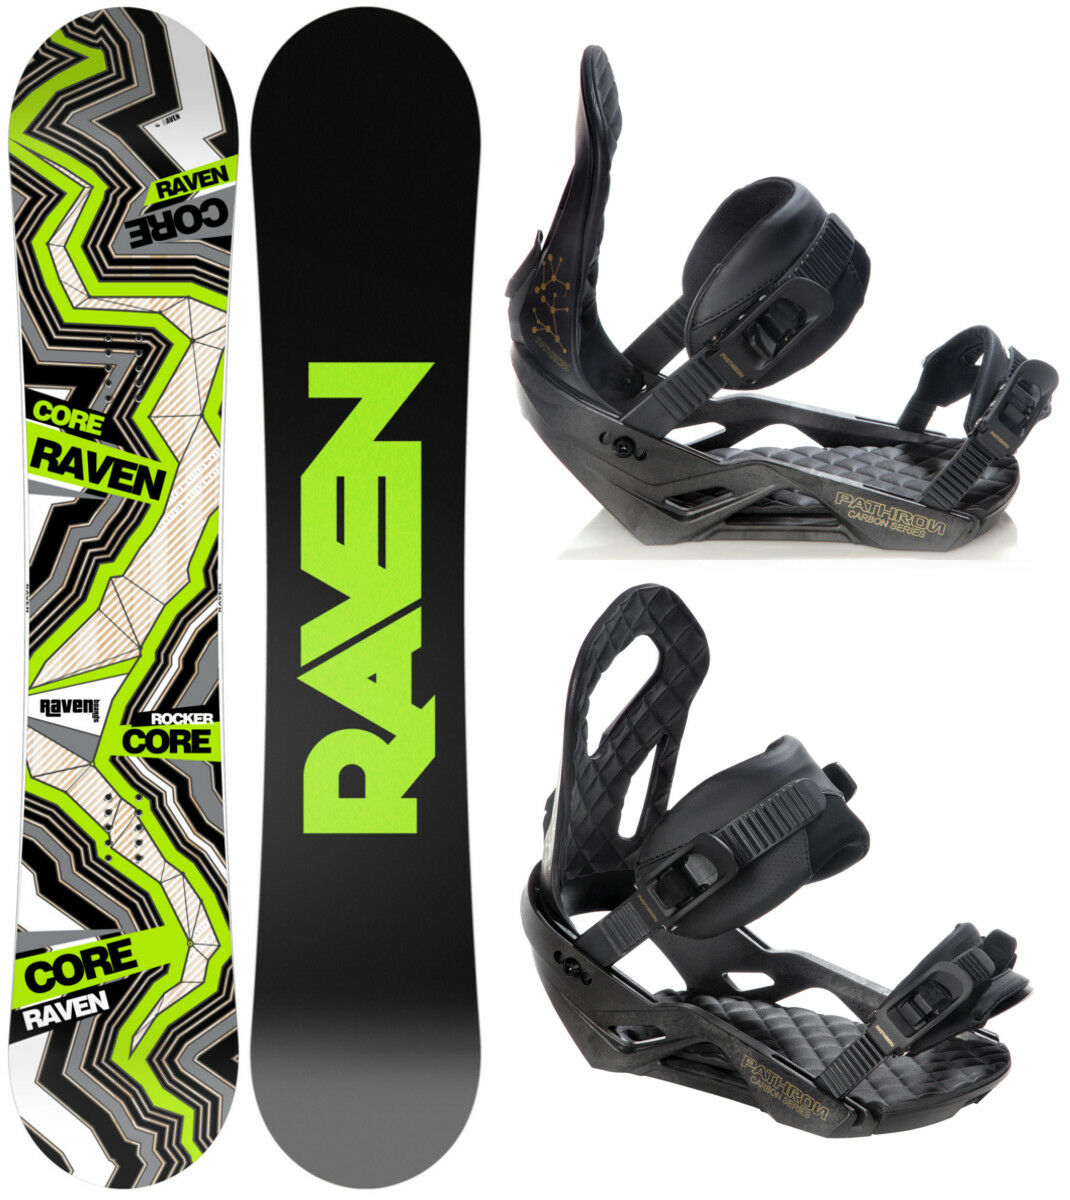 Snowboard Raven Core Carbon Carbon Carbon 2019 + Raven, Pathron oder Croxer Bindung - Neu 273101